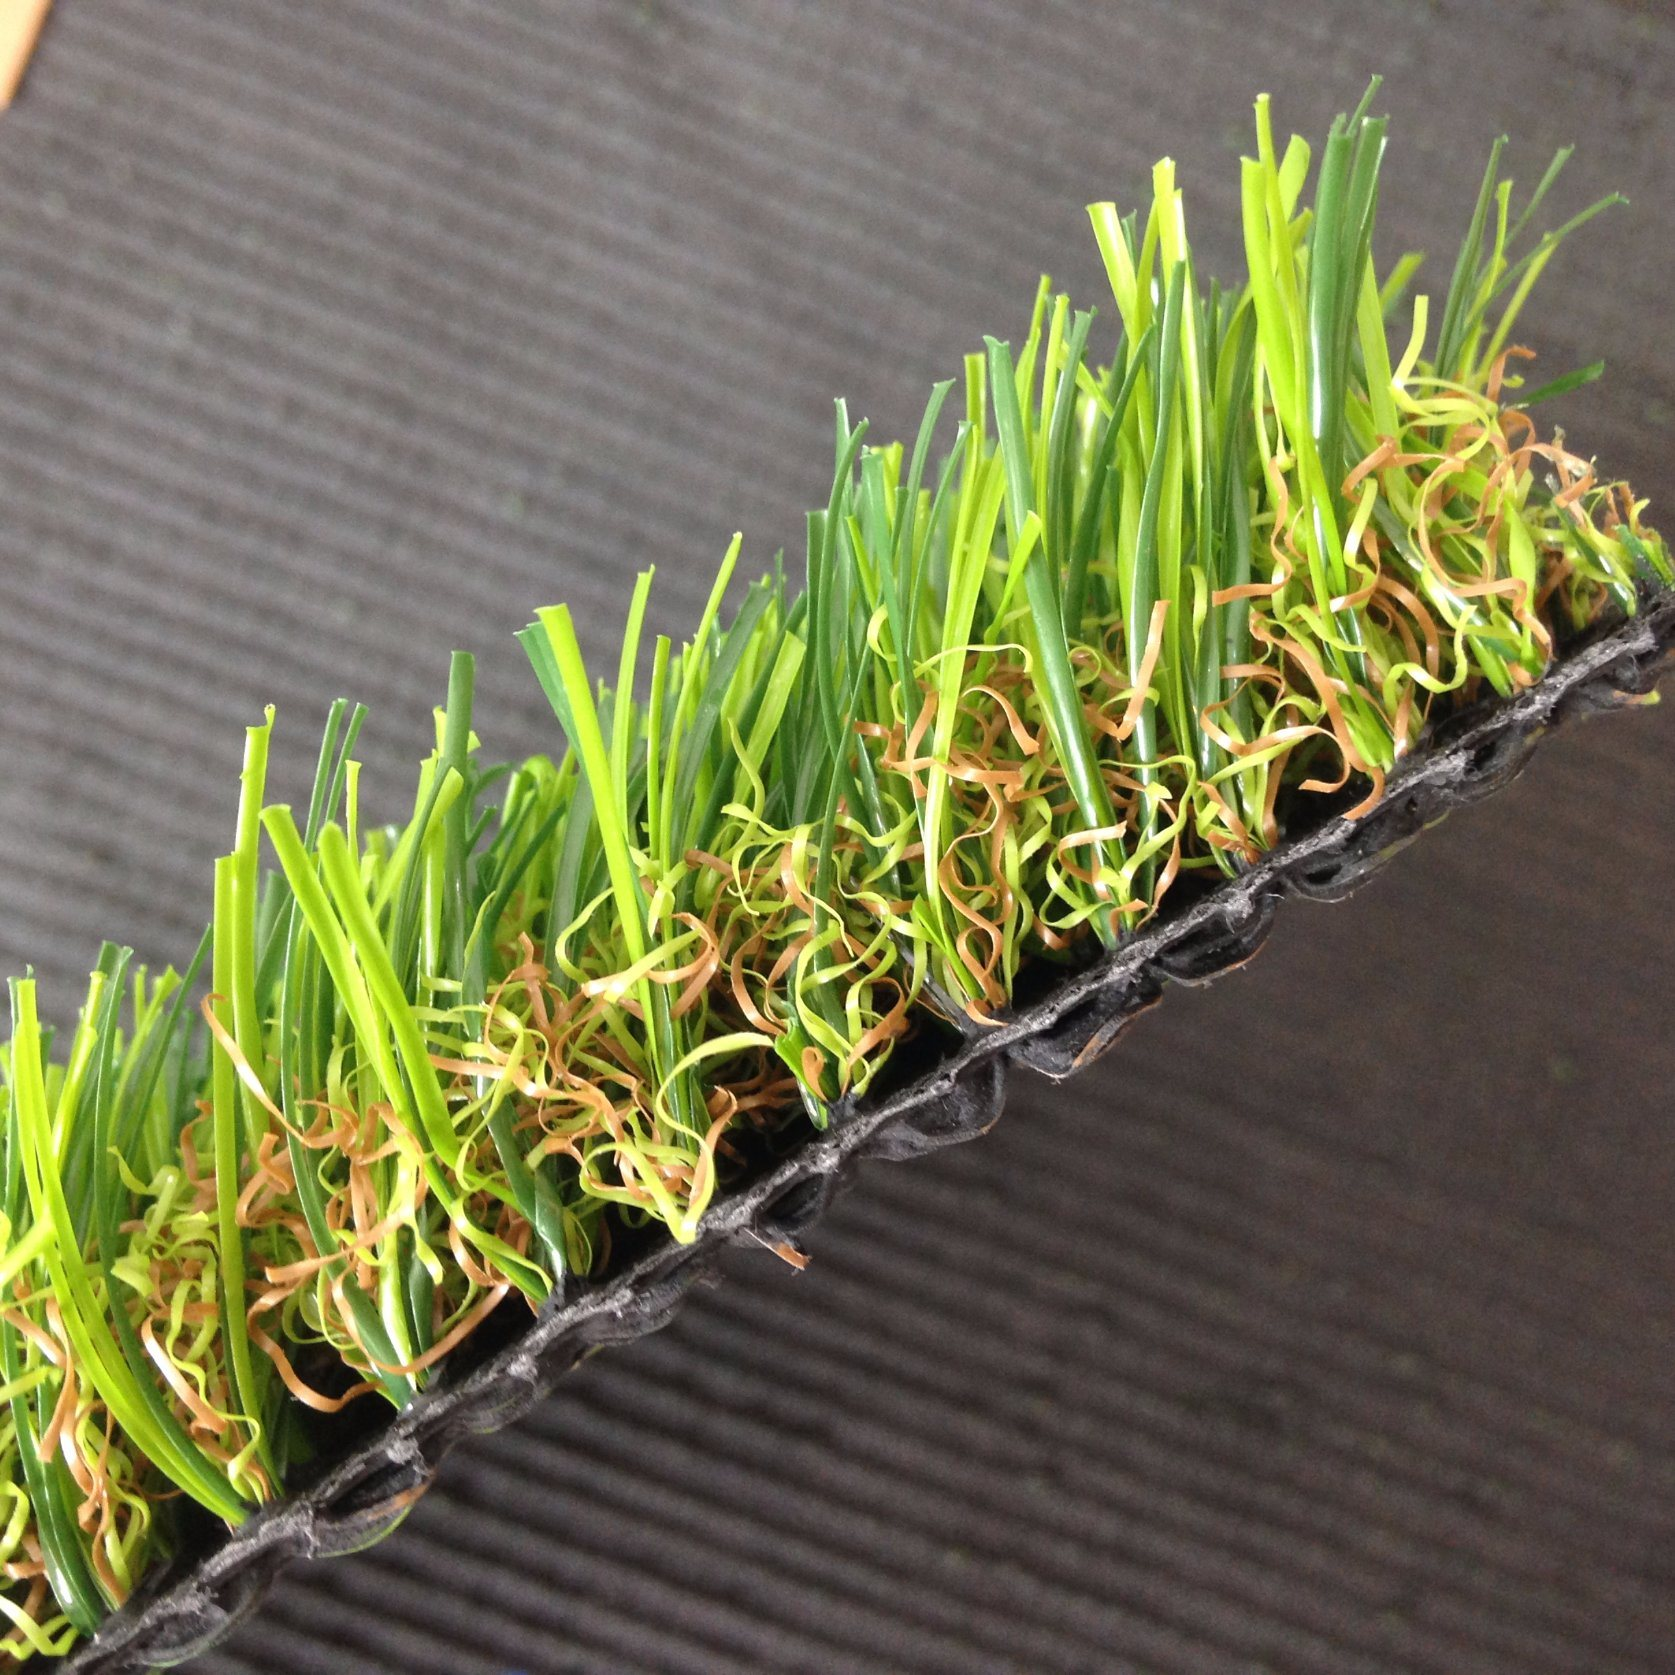 15600tuft Density 2cm-3cm Height Four Color Artificial Turf Grass